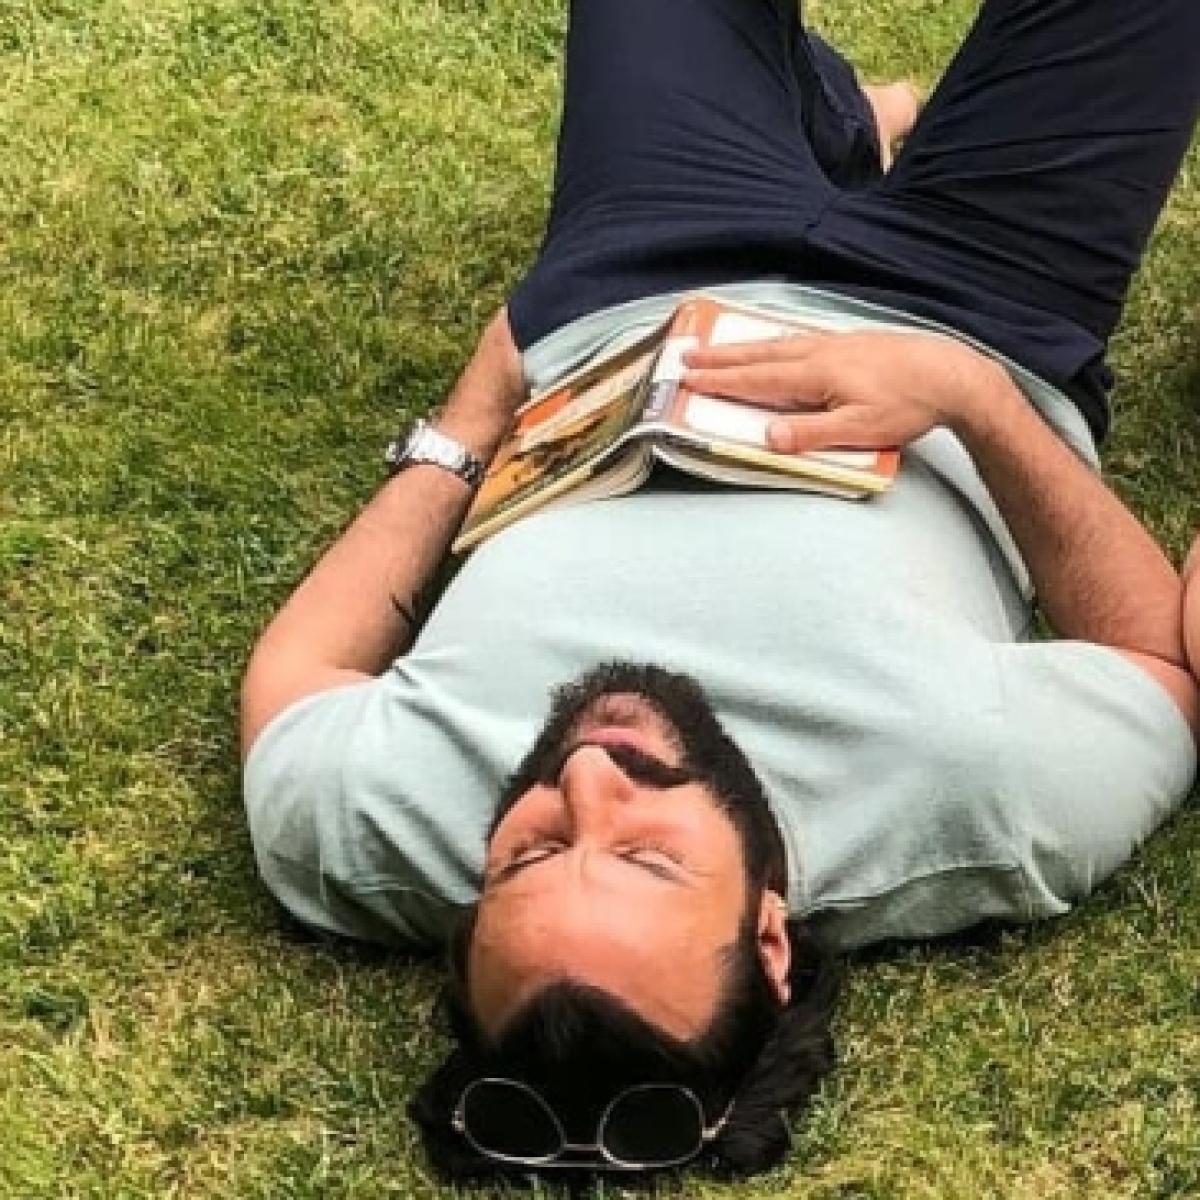 Kareena Kapoor, Saif Ali Khan 'fall asleep' while soaking in the sun amid lockdown; see pics